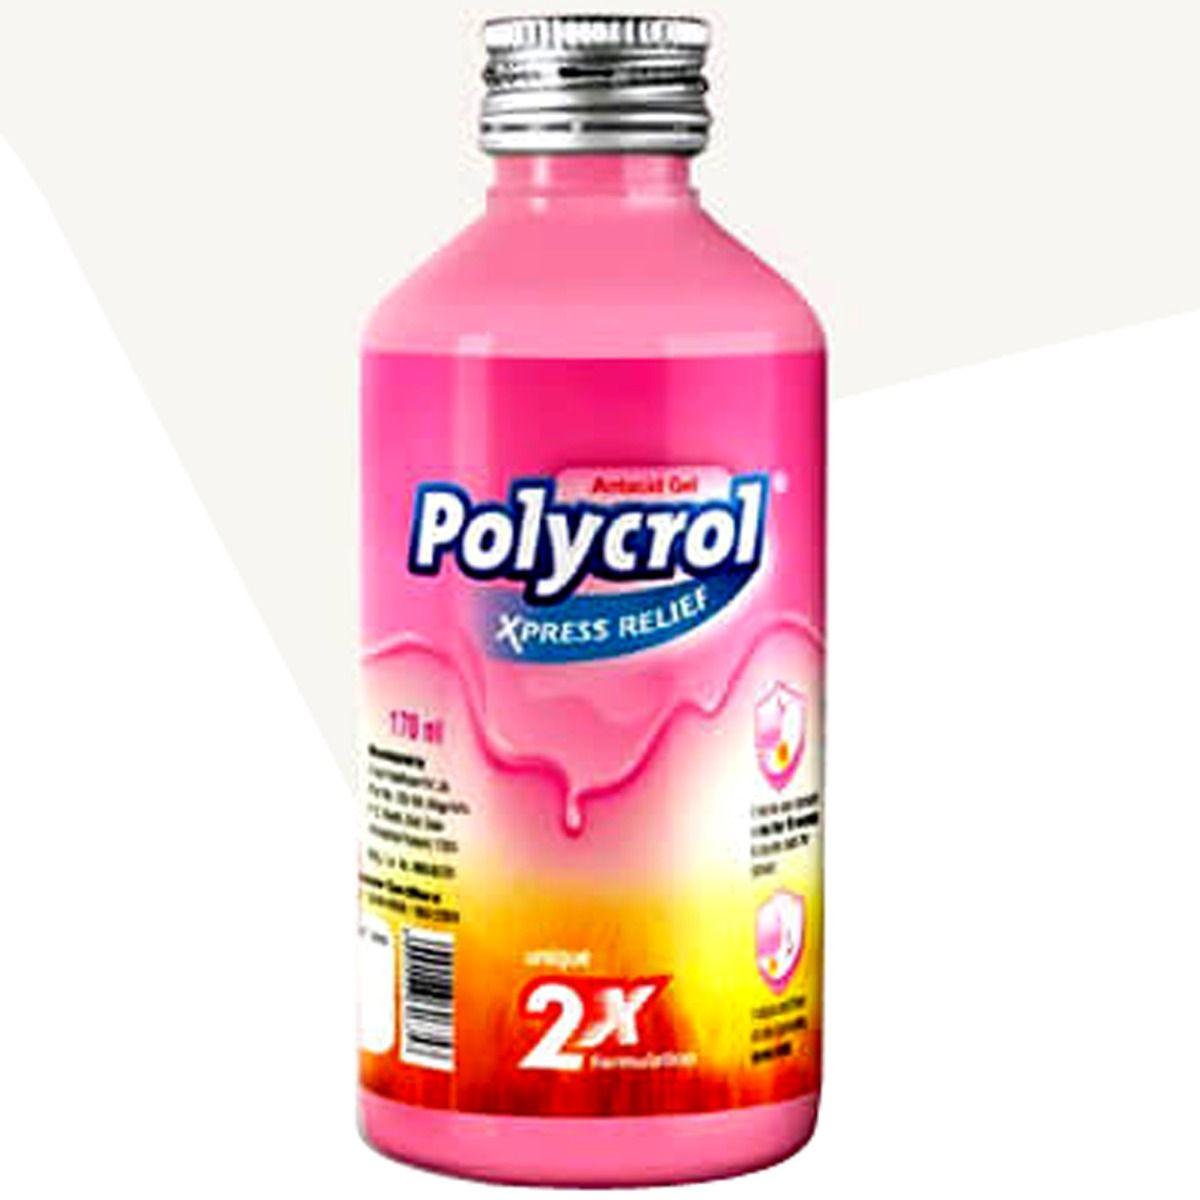 Polycrol Xpress Relief  Syrup, 450 ml